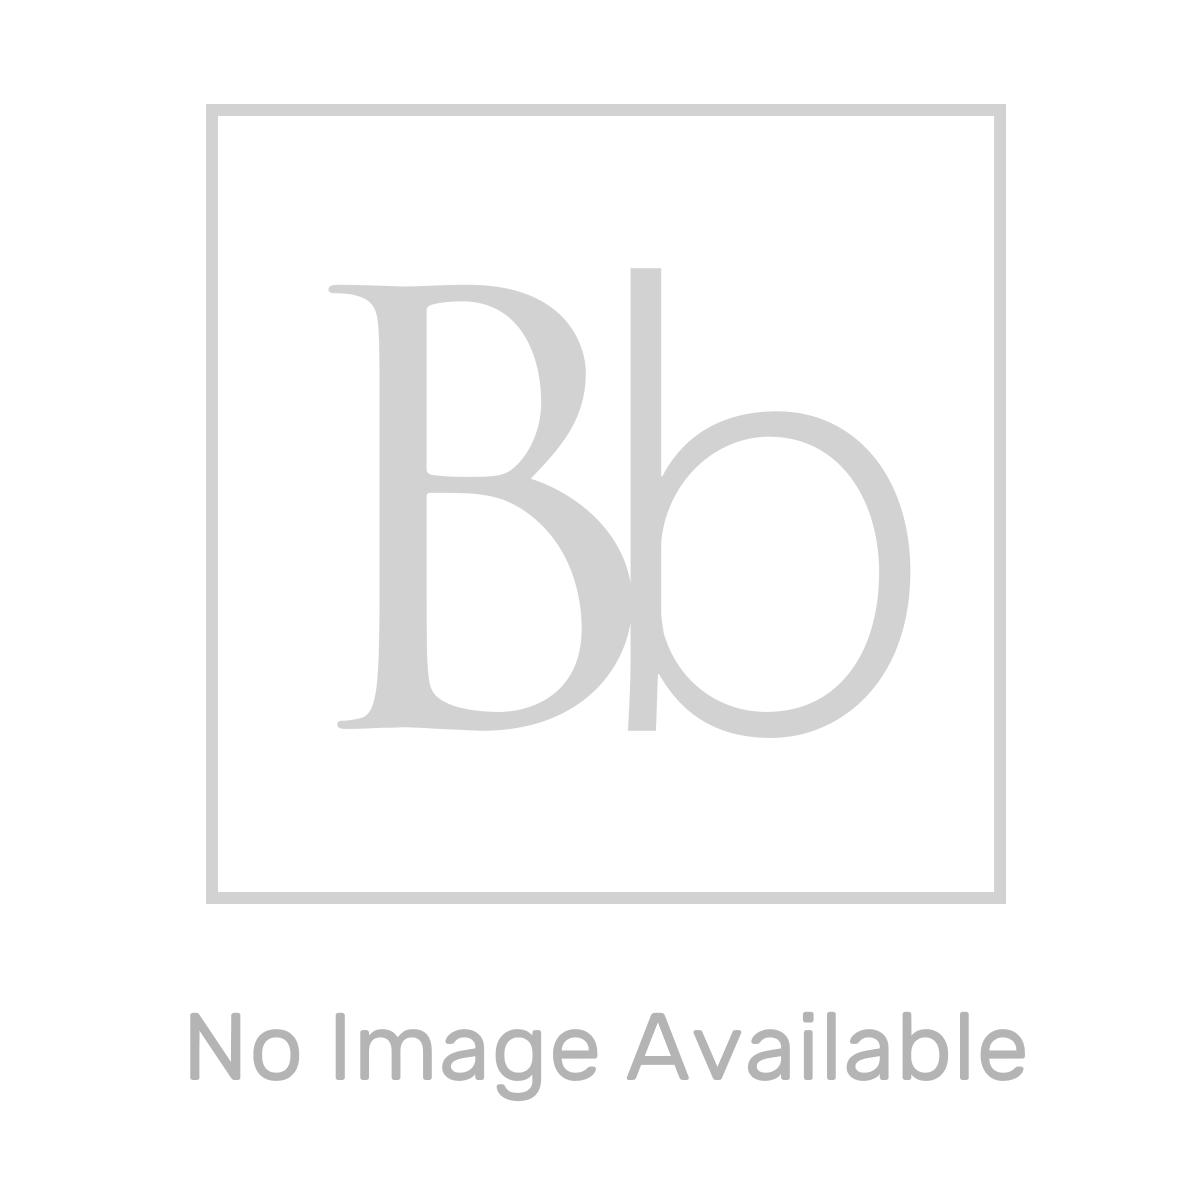 RAK Series 600 Bathroom Suite with Pivot Shower Enclosure Handle